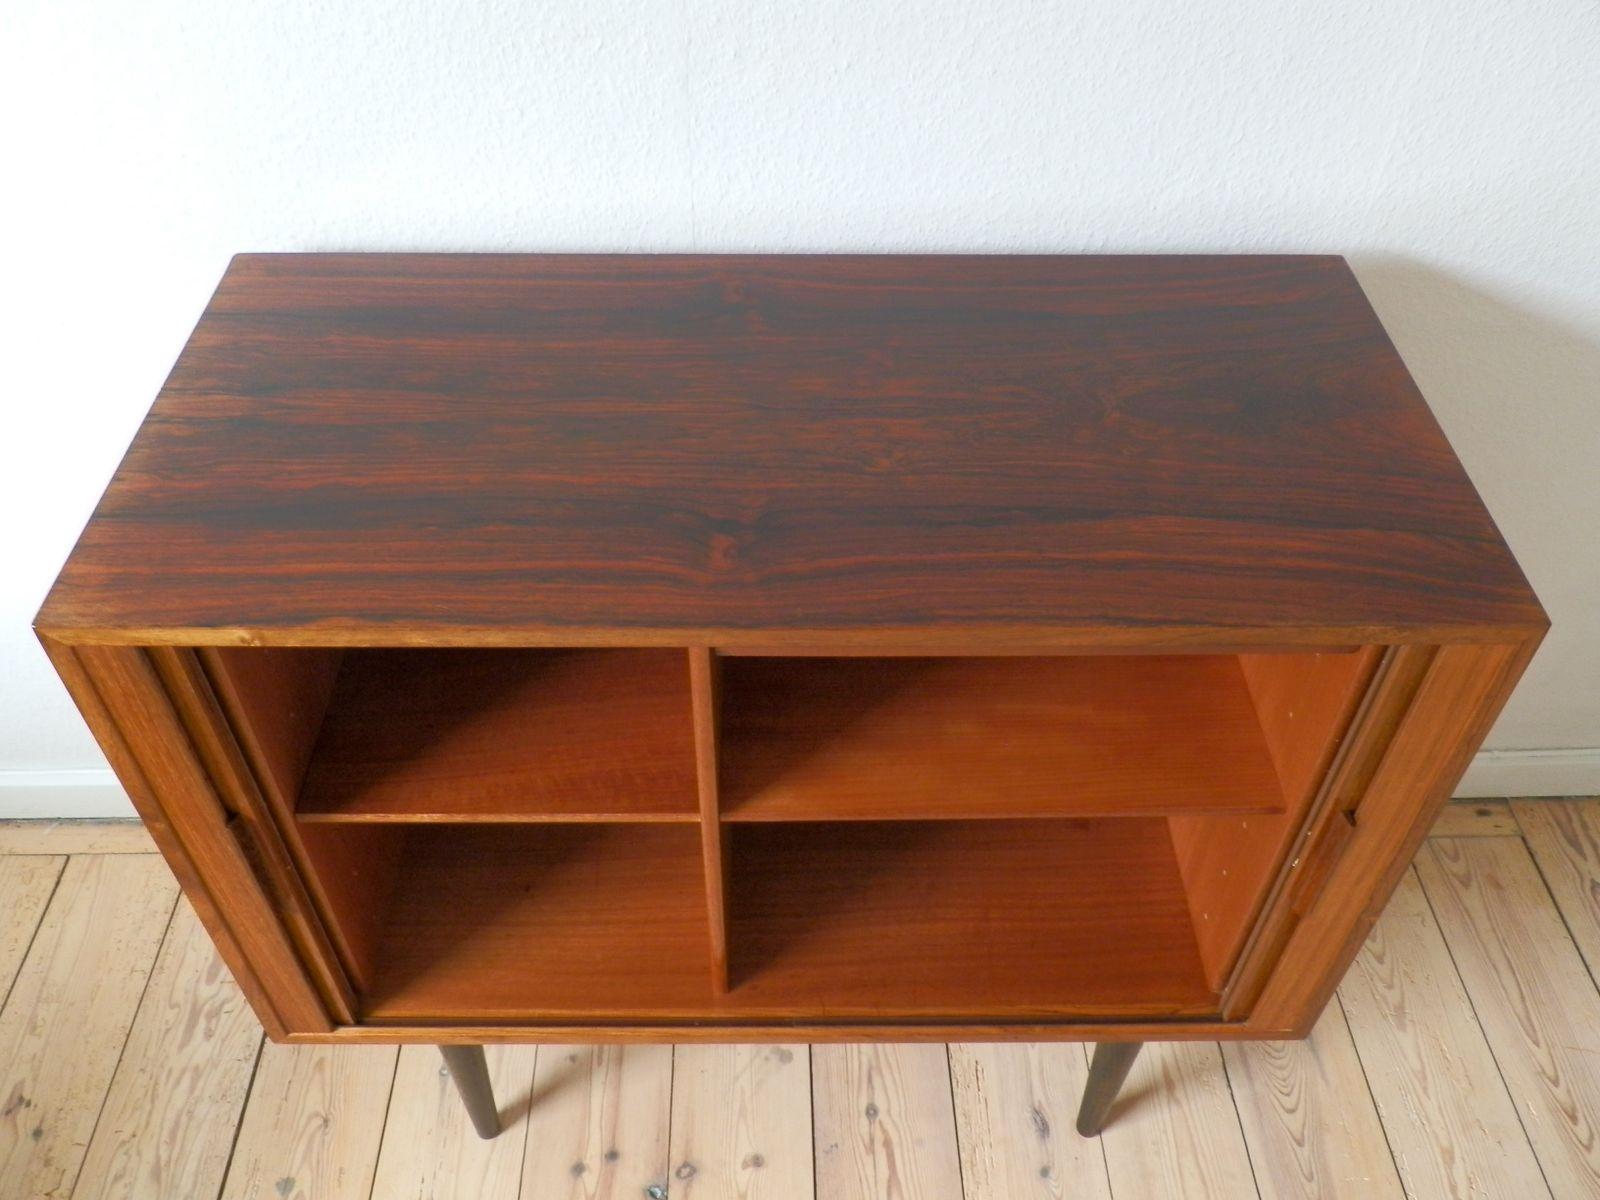 scandinavian cabinet by kai kristiansen for feldballes m bel for sale at pamono. Black Bedroom Furniture Sets. Home Design Ideas